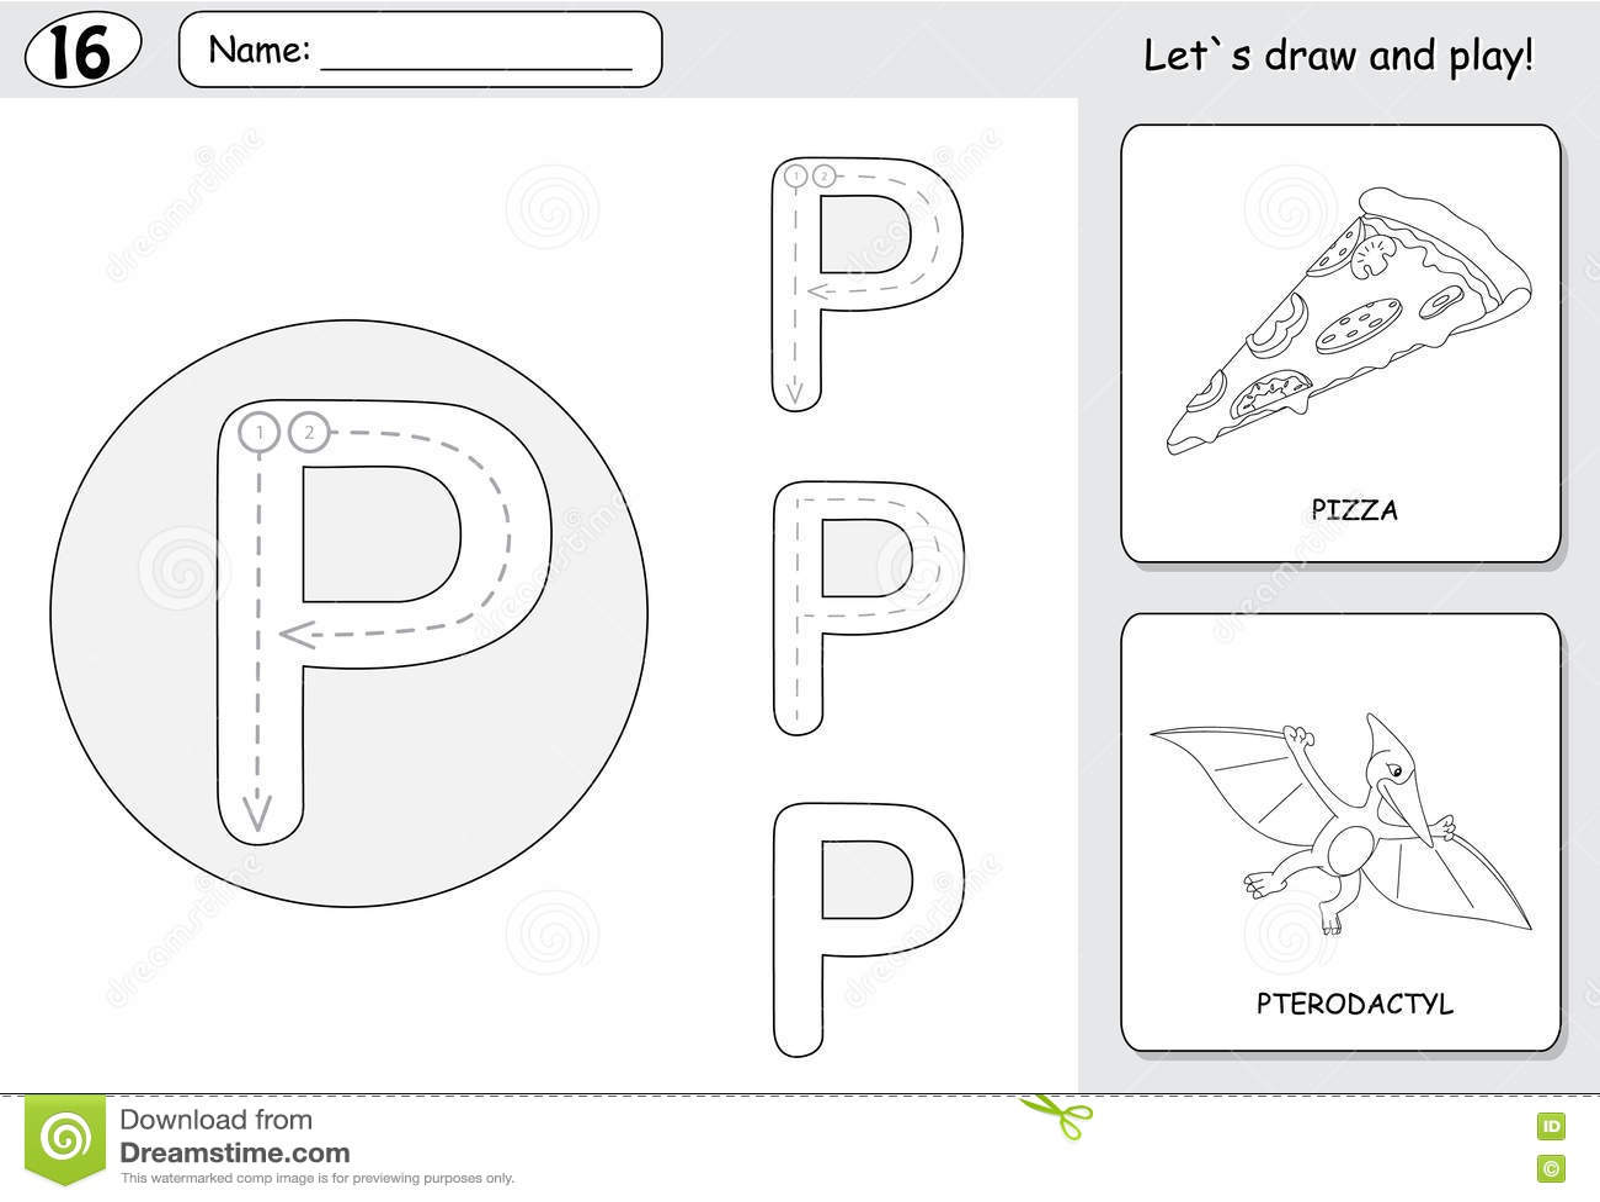 Cartoon Pizza And Pterodactyl. Alphabet Tracing Worksheet